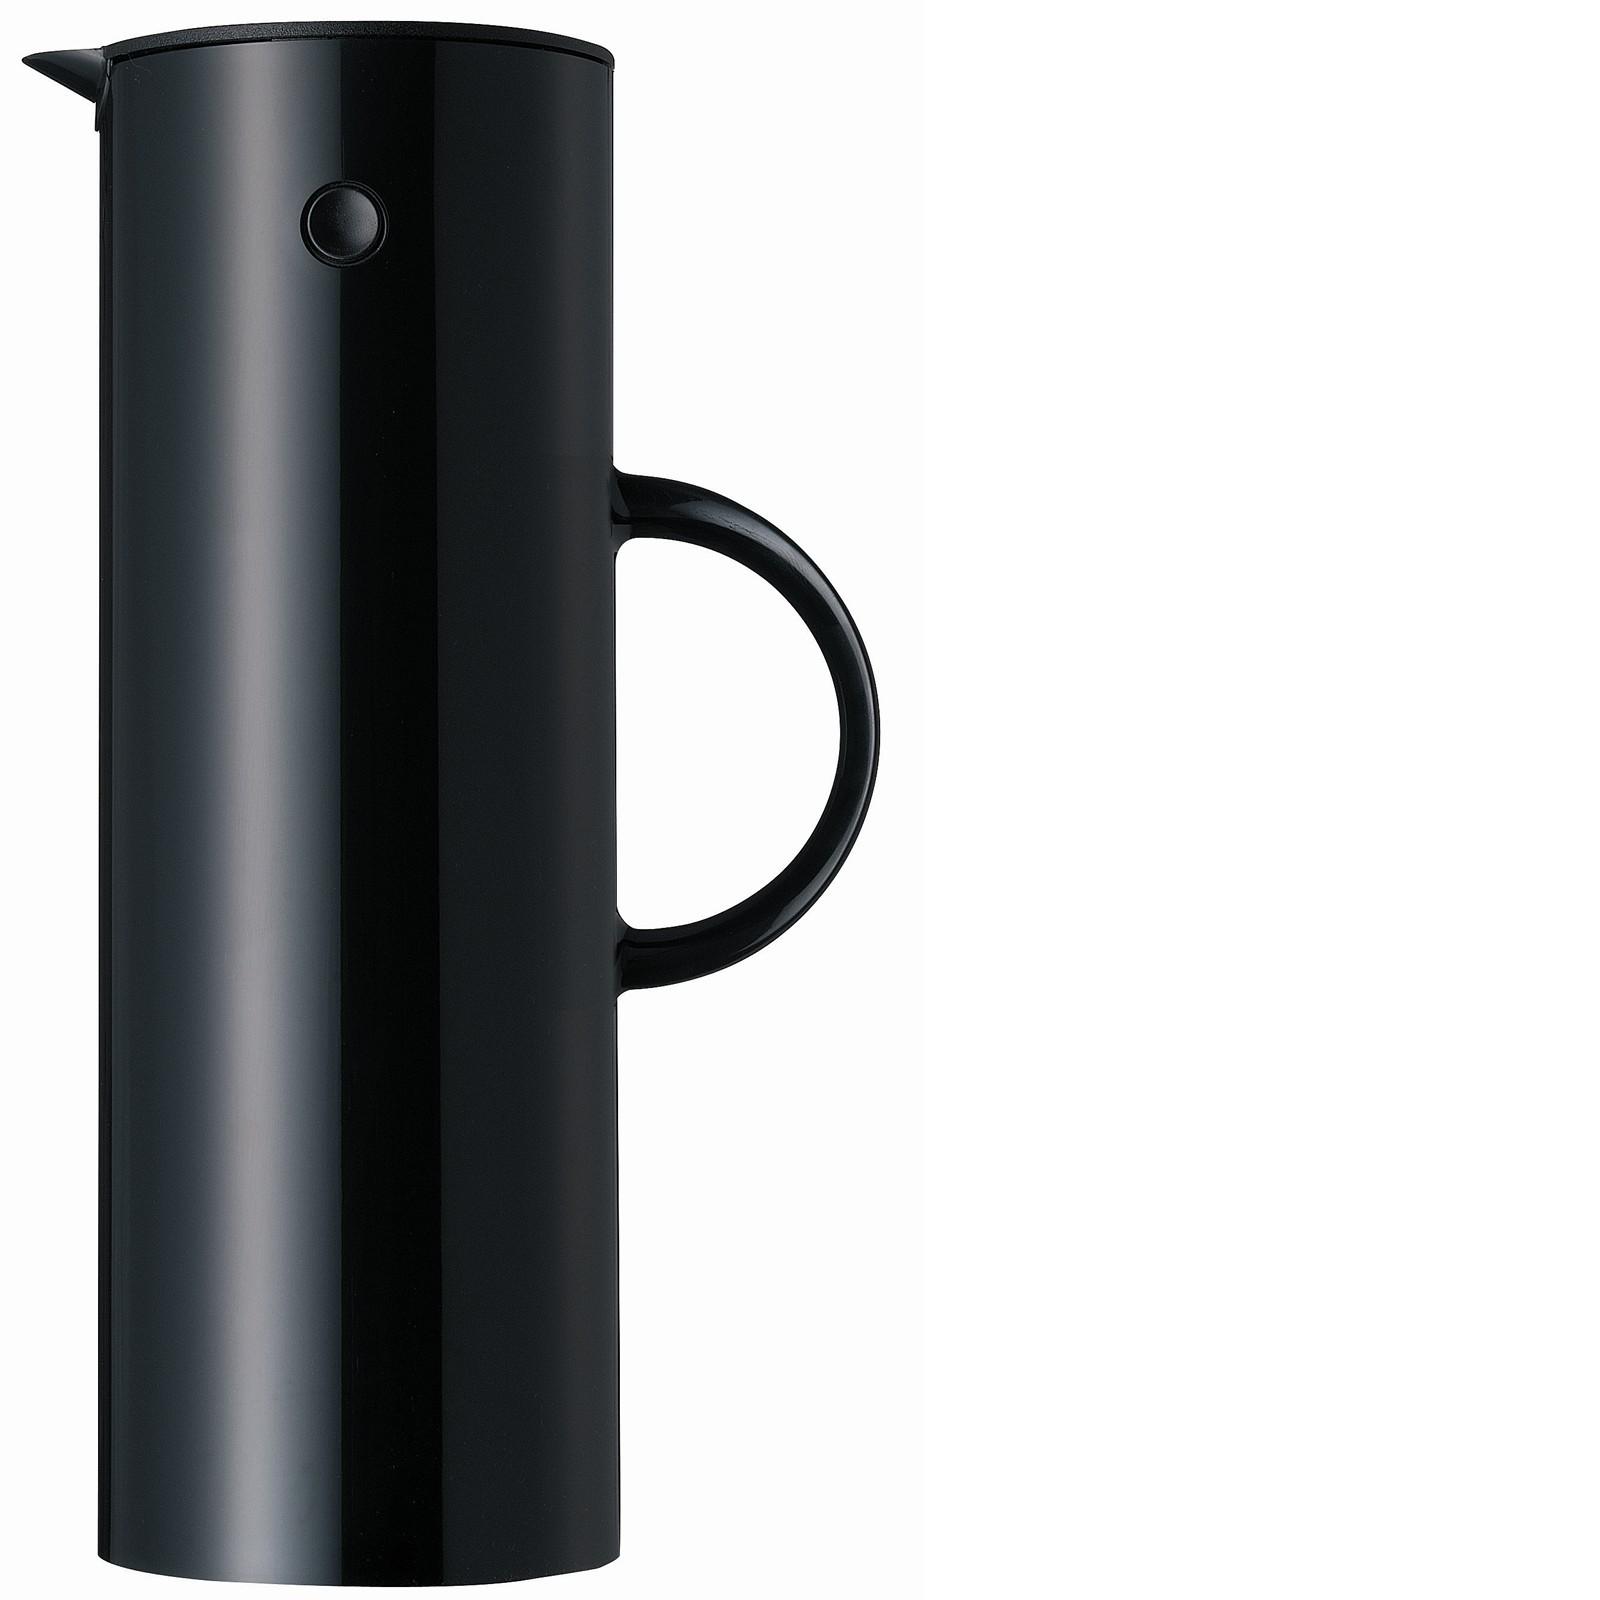 stelton isolierkanne thermoskanne 1 l schwarz. Black Bedroom Furniture Sets. Home Design Ideas